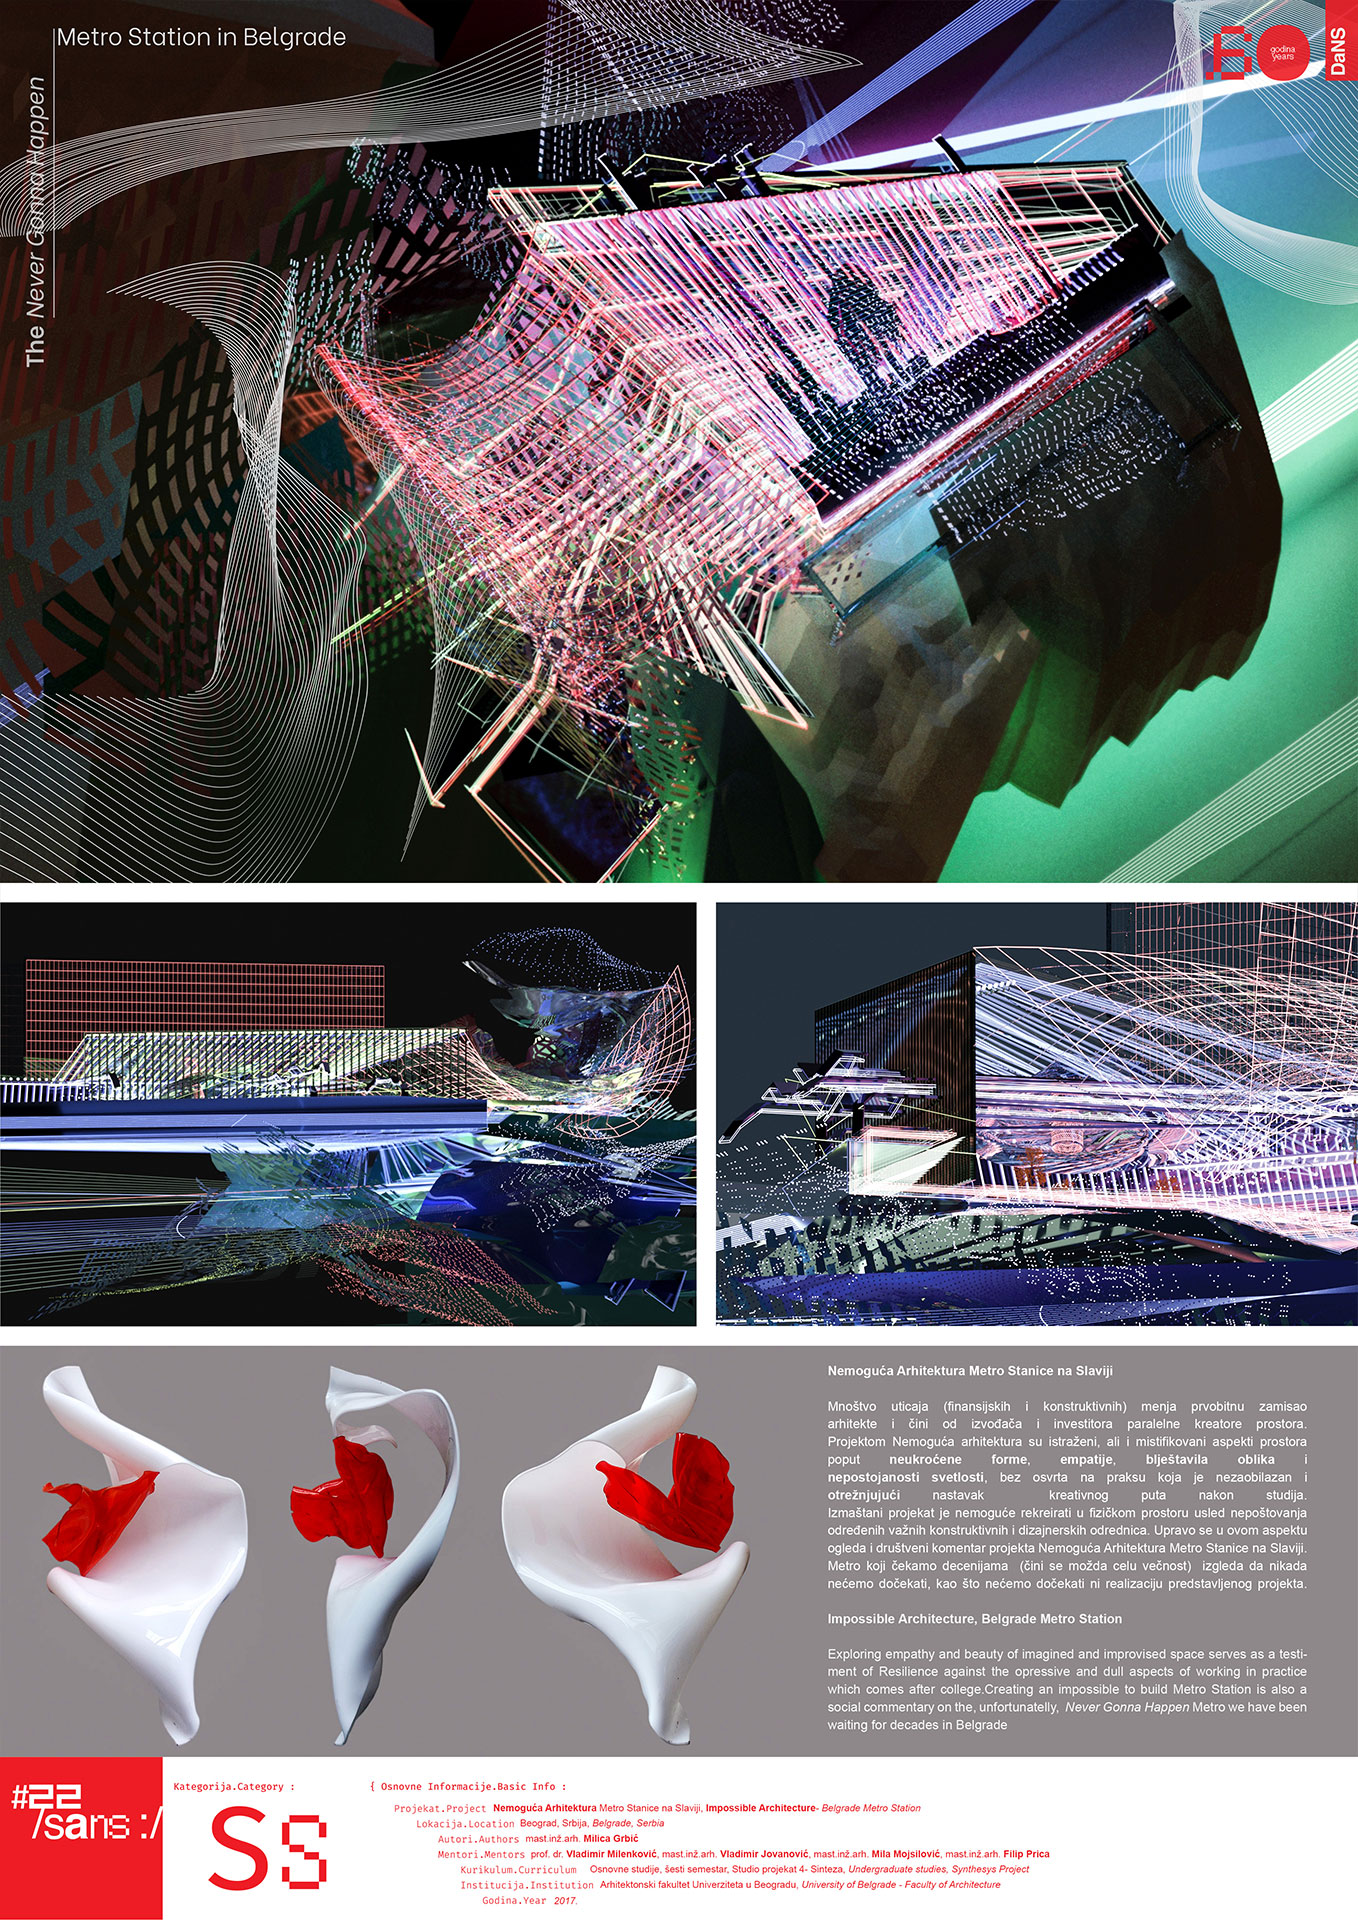 "<p class=""naslov-br"">ss08</p>Nemoguća Arhitektura: Metro Stanica na Slaviji // The Impossible Architecture: Slavija Metro Station"